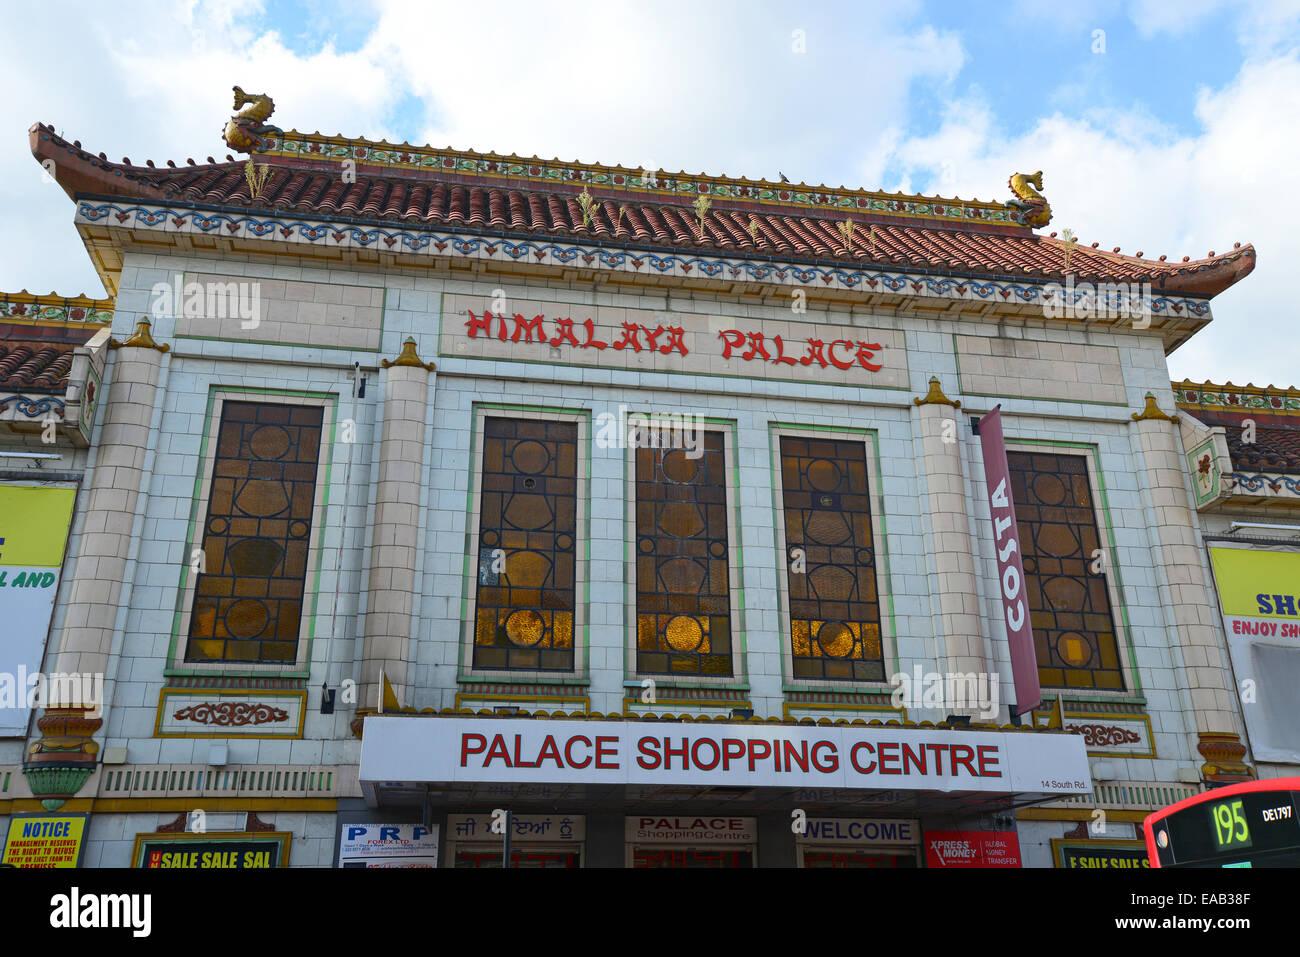 Himalaya Palace Cinema, South Road, Southall, London Borough of Ealing, Greater London, England, Regno Unito Immagini Stock